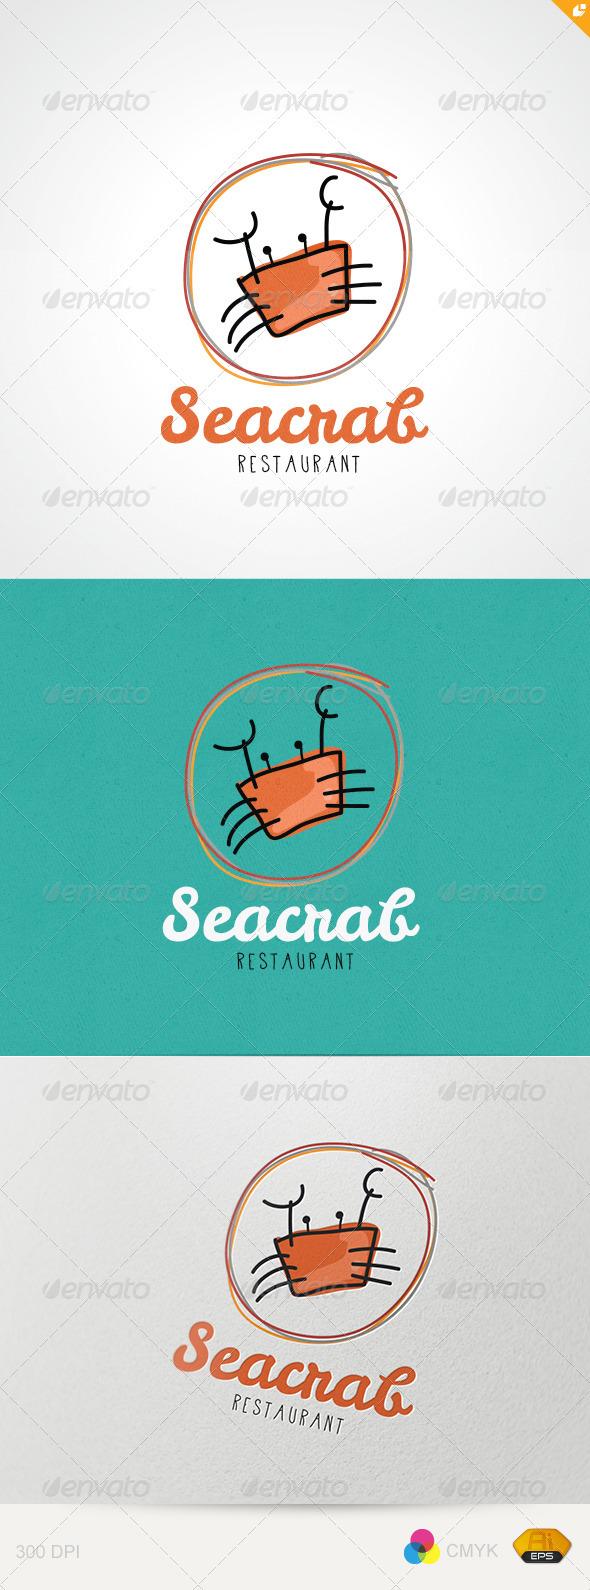 Sea Crab Restaurant - Restaurant Logo Templates